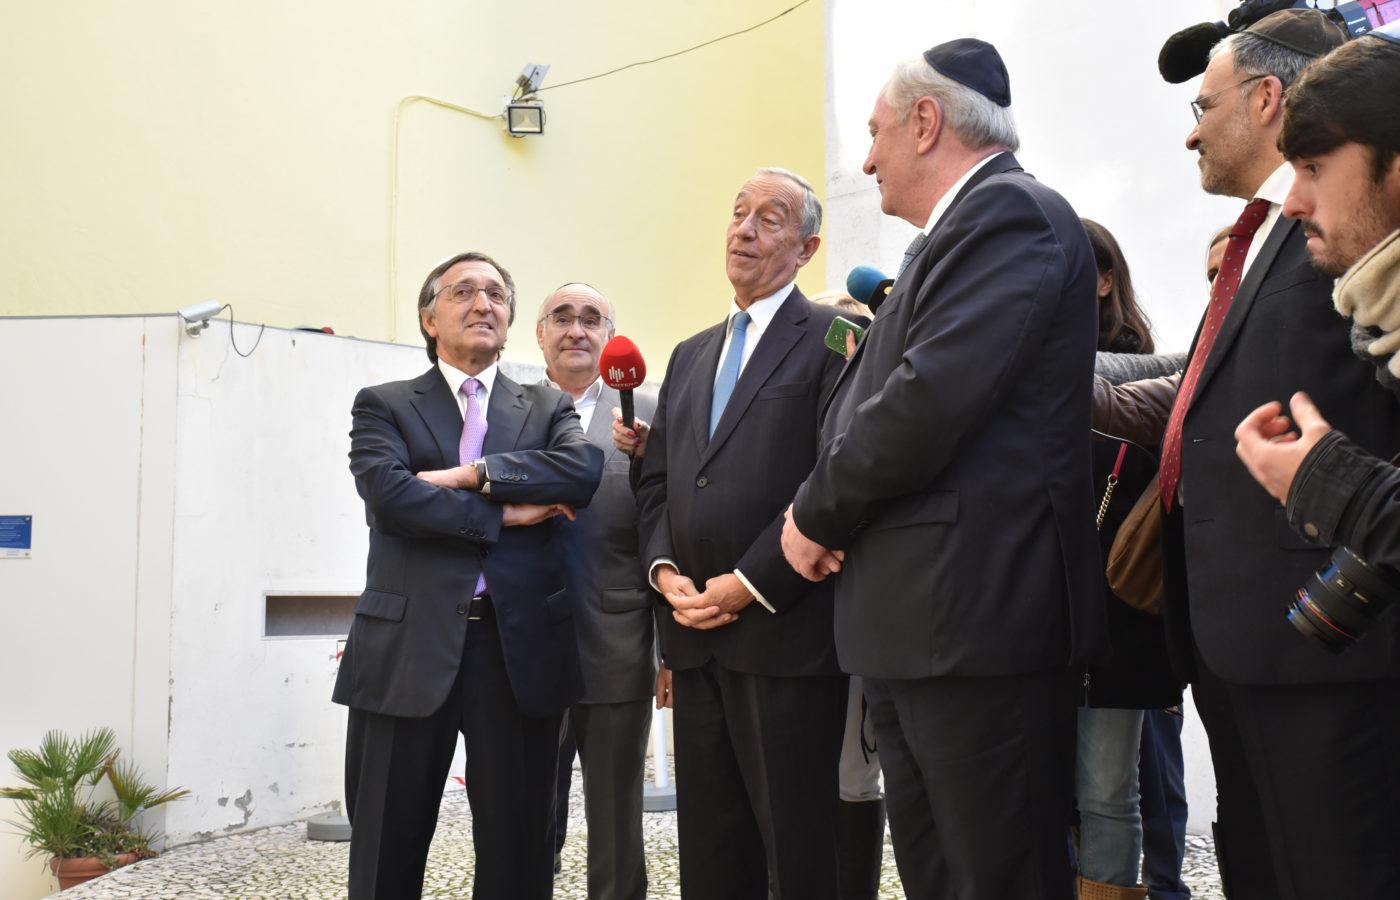 evento-sinagoga-64